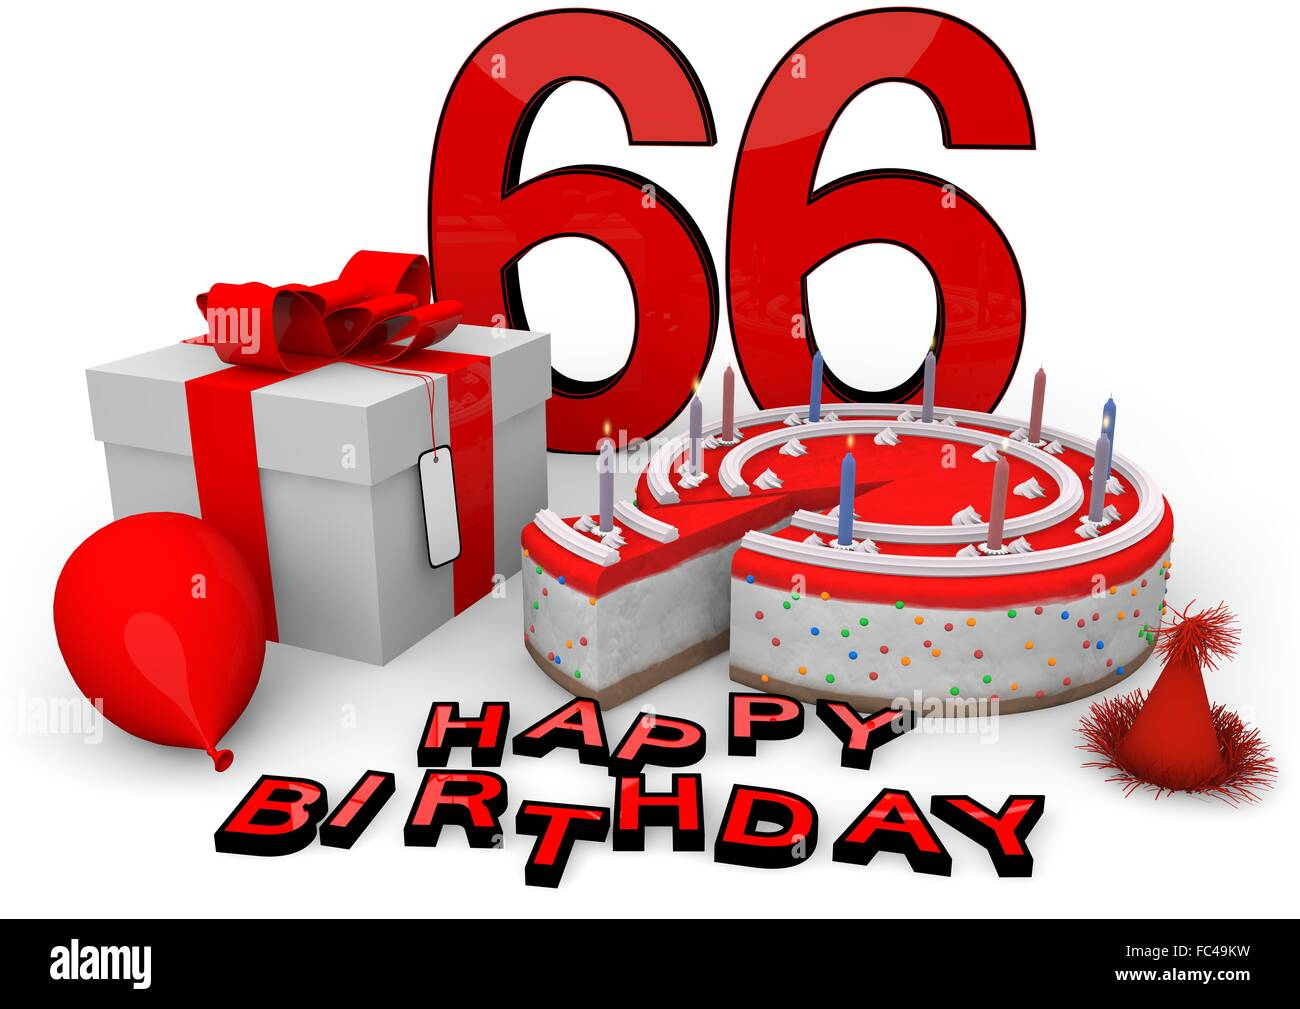 happy birthday zum 66 geburtstag stockfotos happy. Black Bedroom Furniture Sets. Home Design Ideas